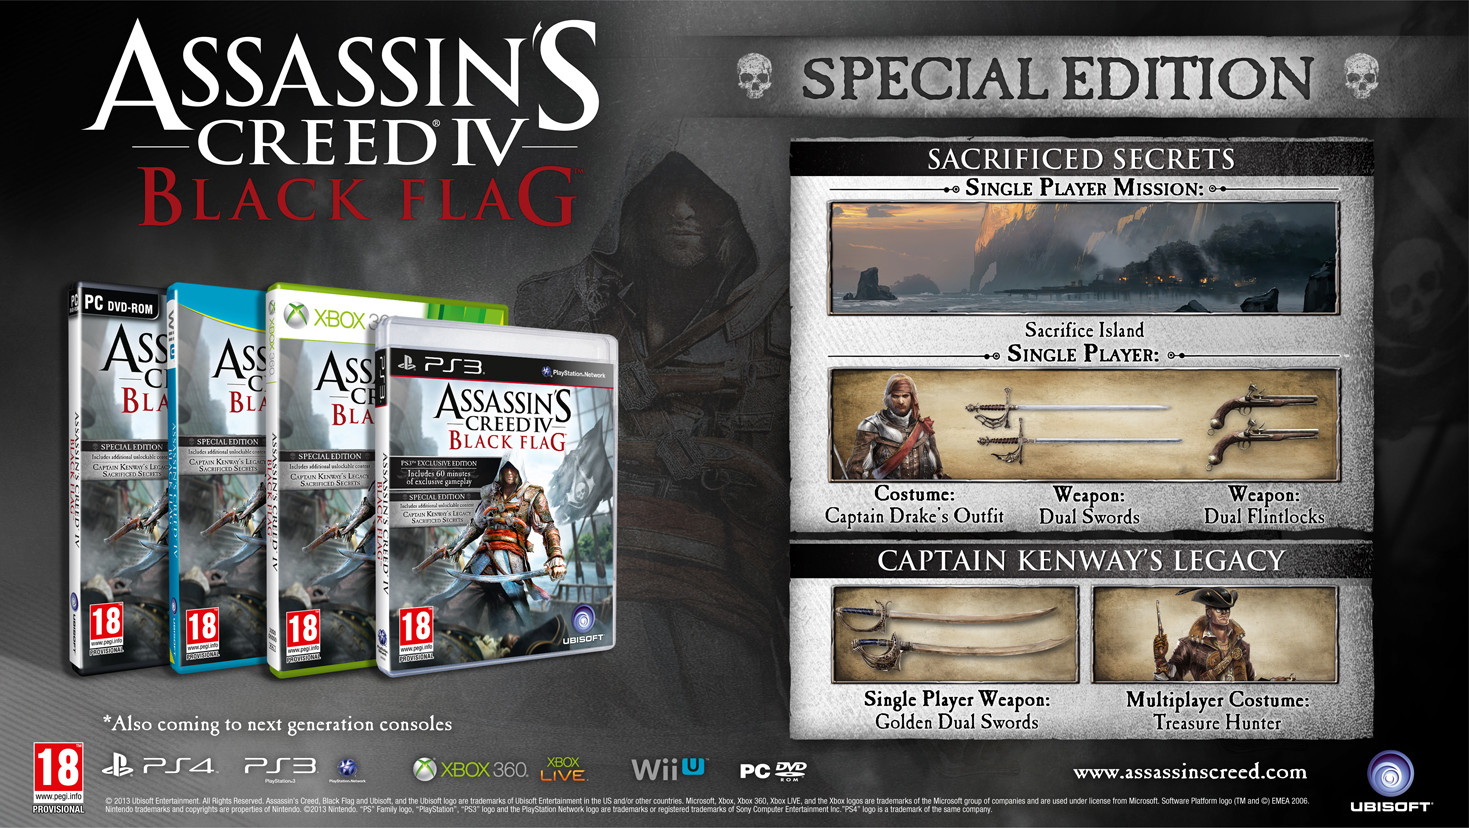 [PS3/PS4/Xbox 360/PC/Wii U] Assassin's Creed 4 Black Flag AcvWOv6r